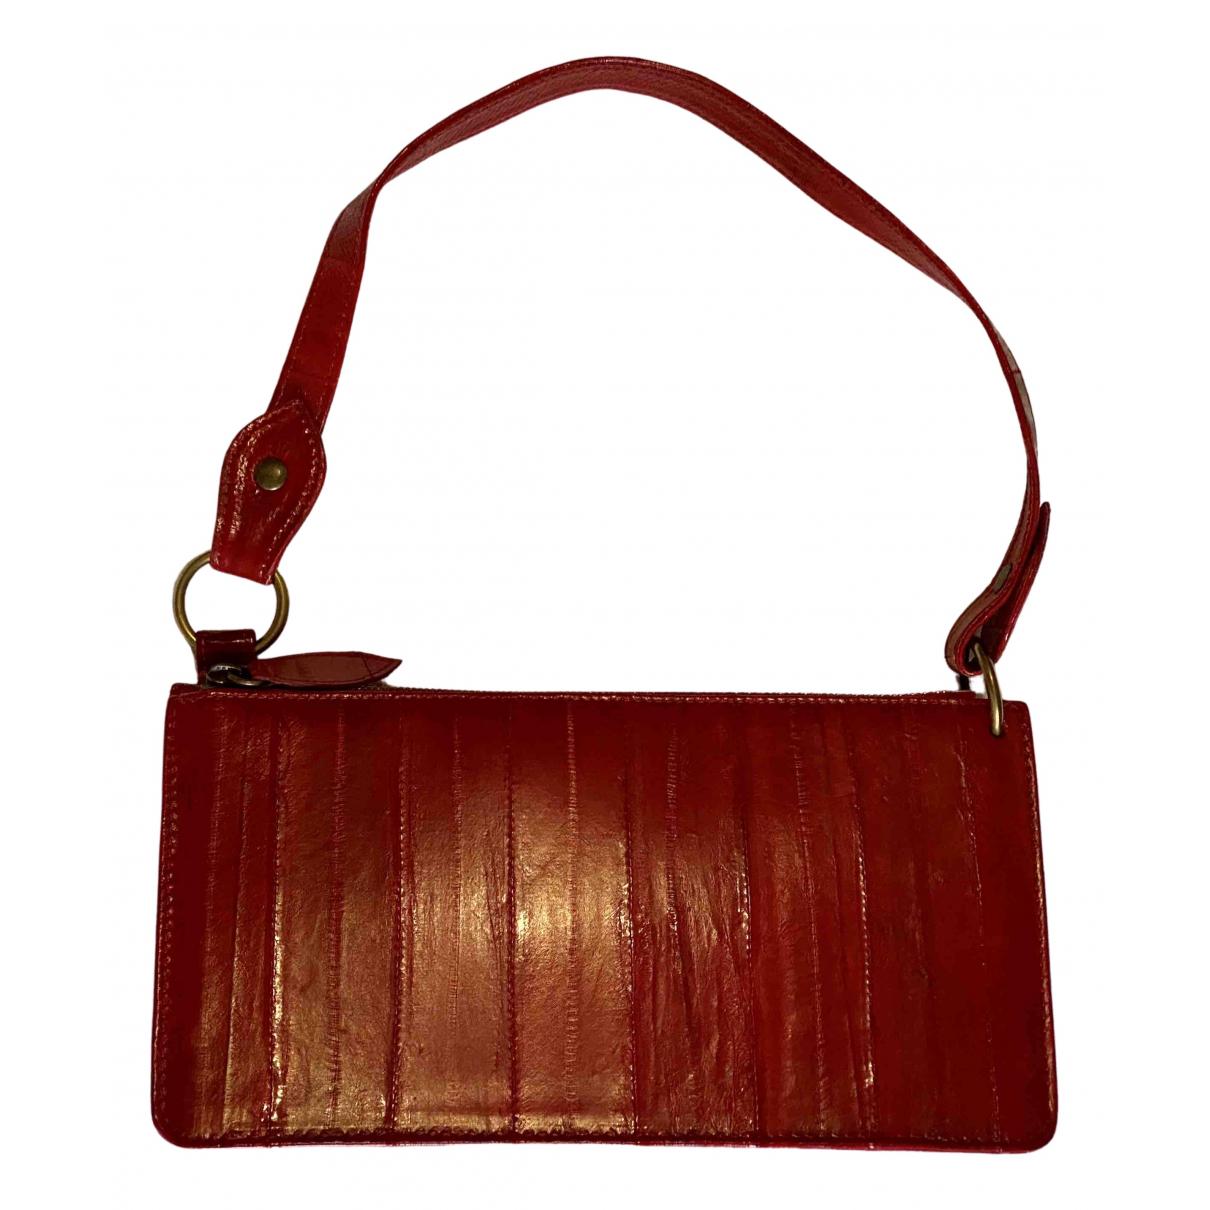 Charles Jourdan N Red Leather Clutch bag for Women N